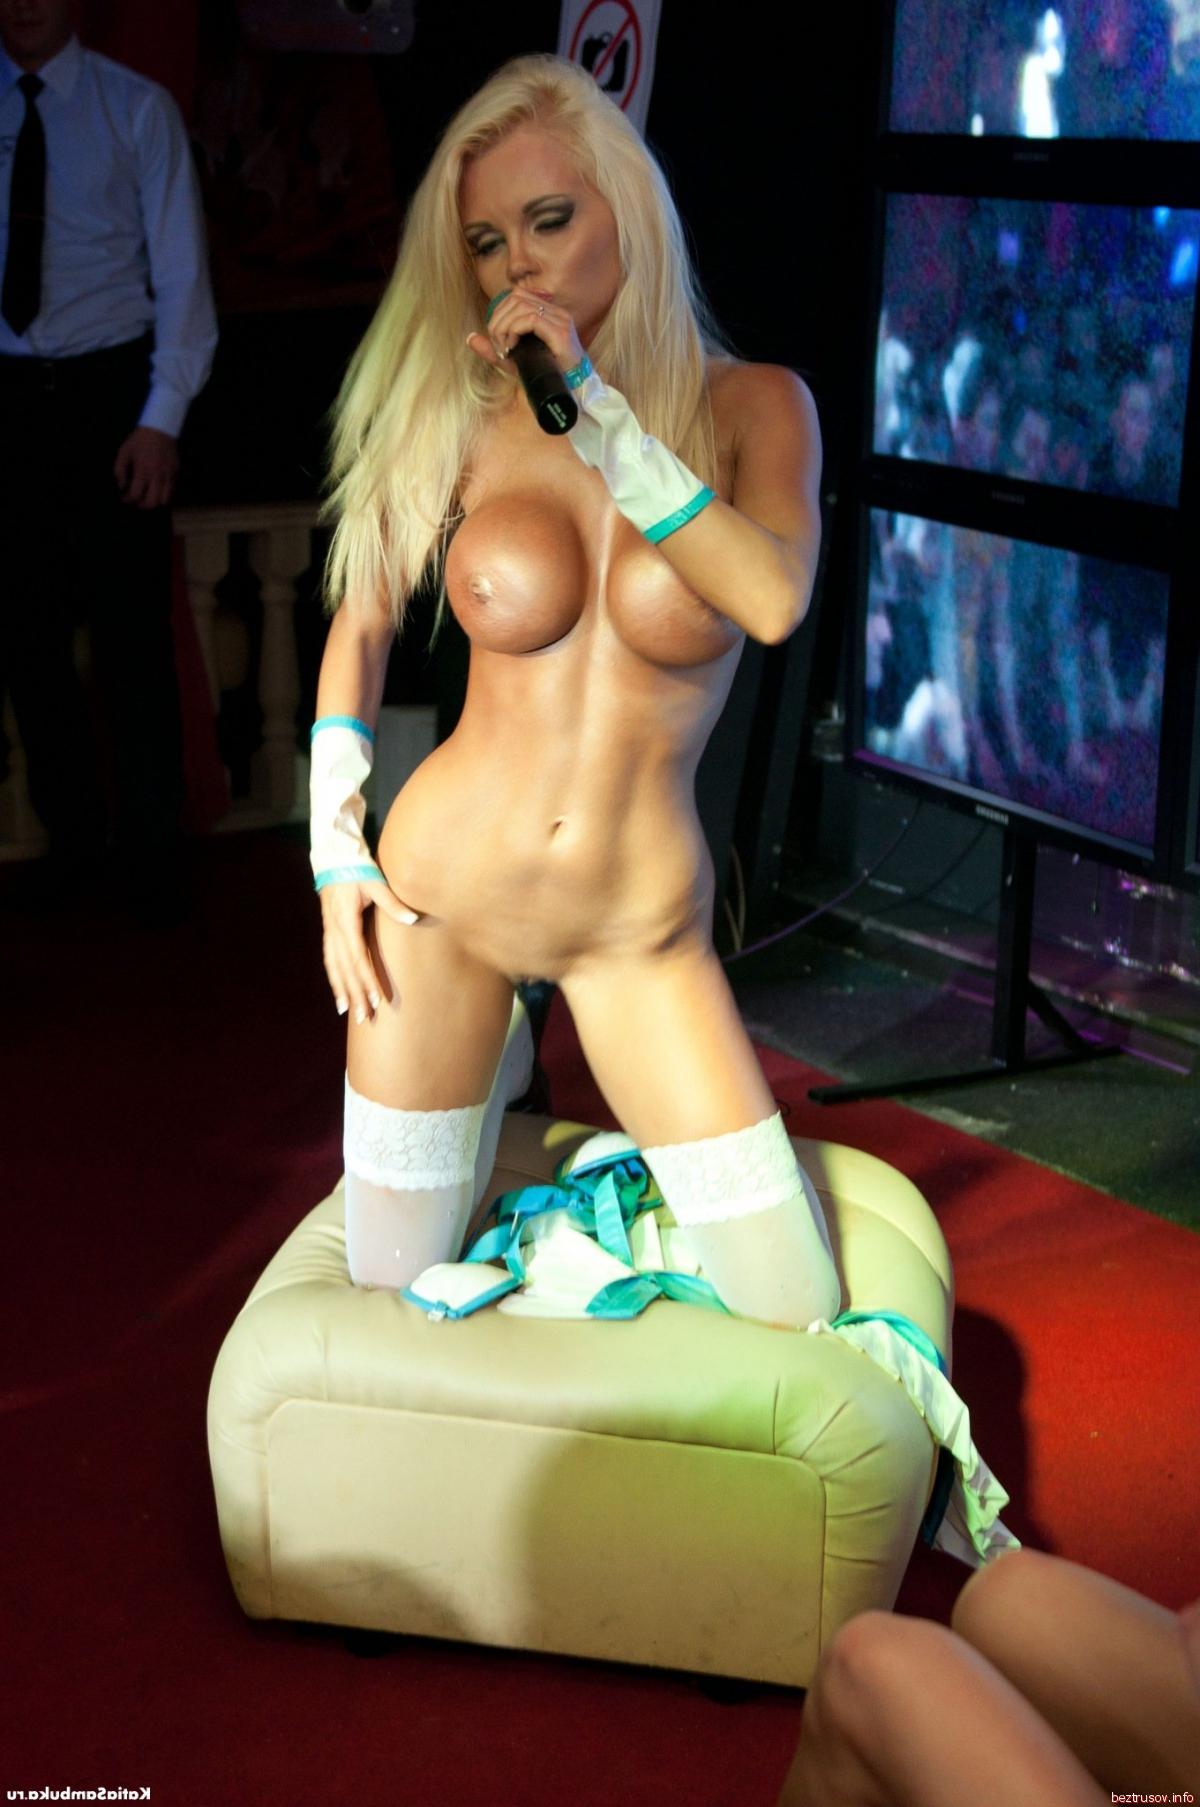 Видео фото катя самбука порно